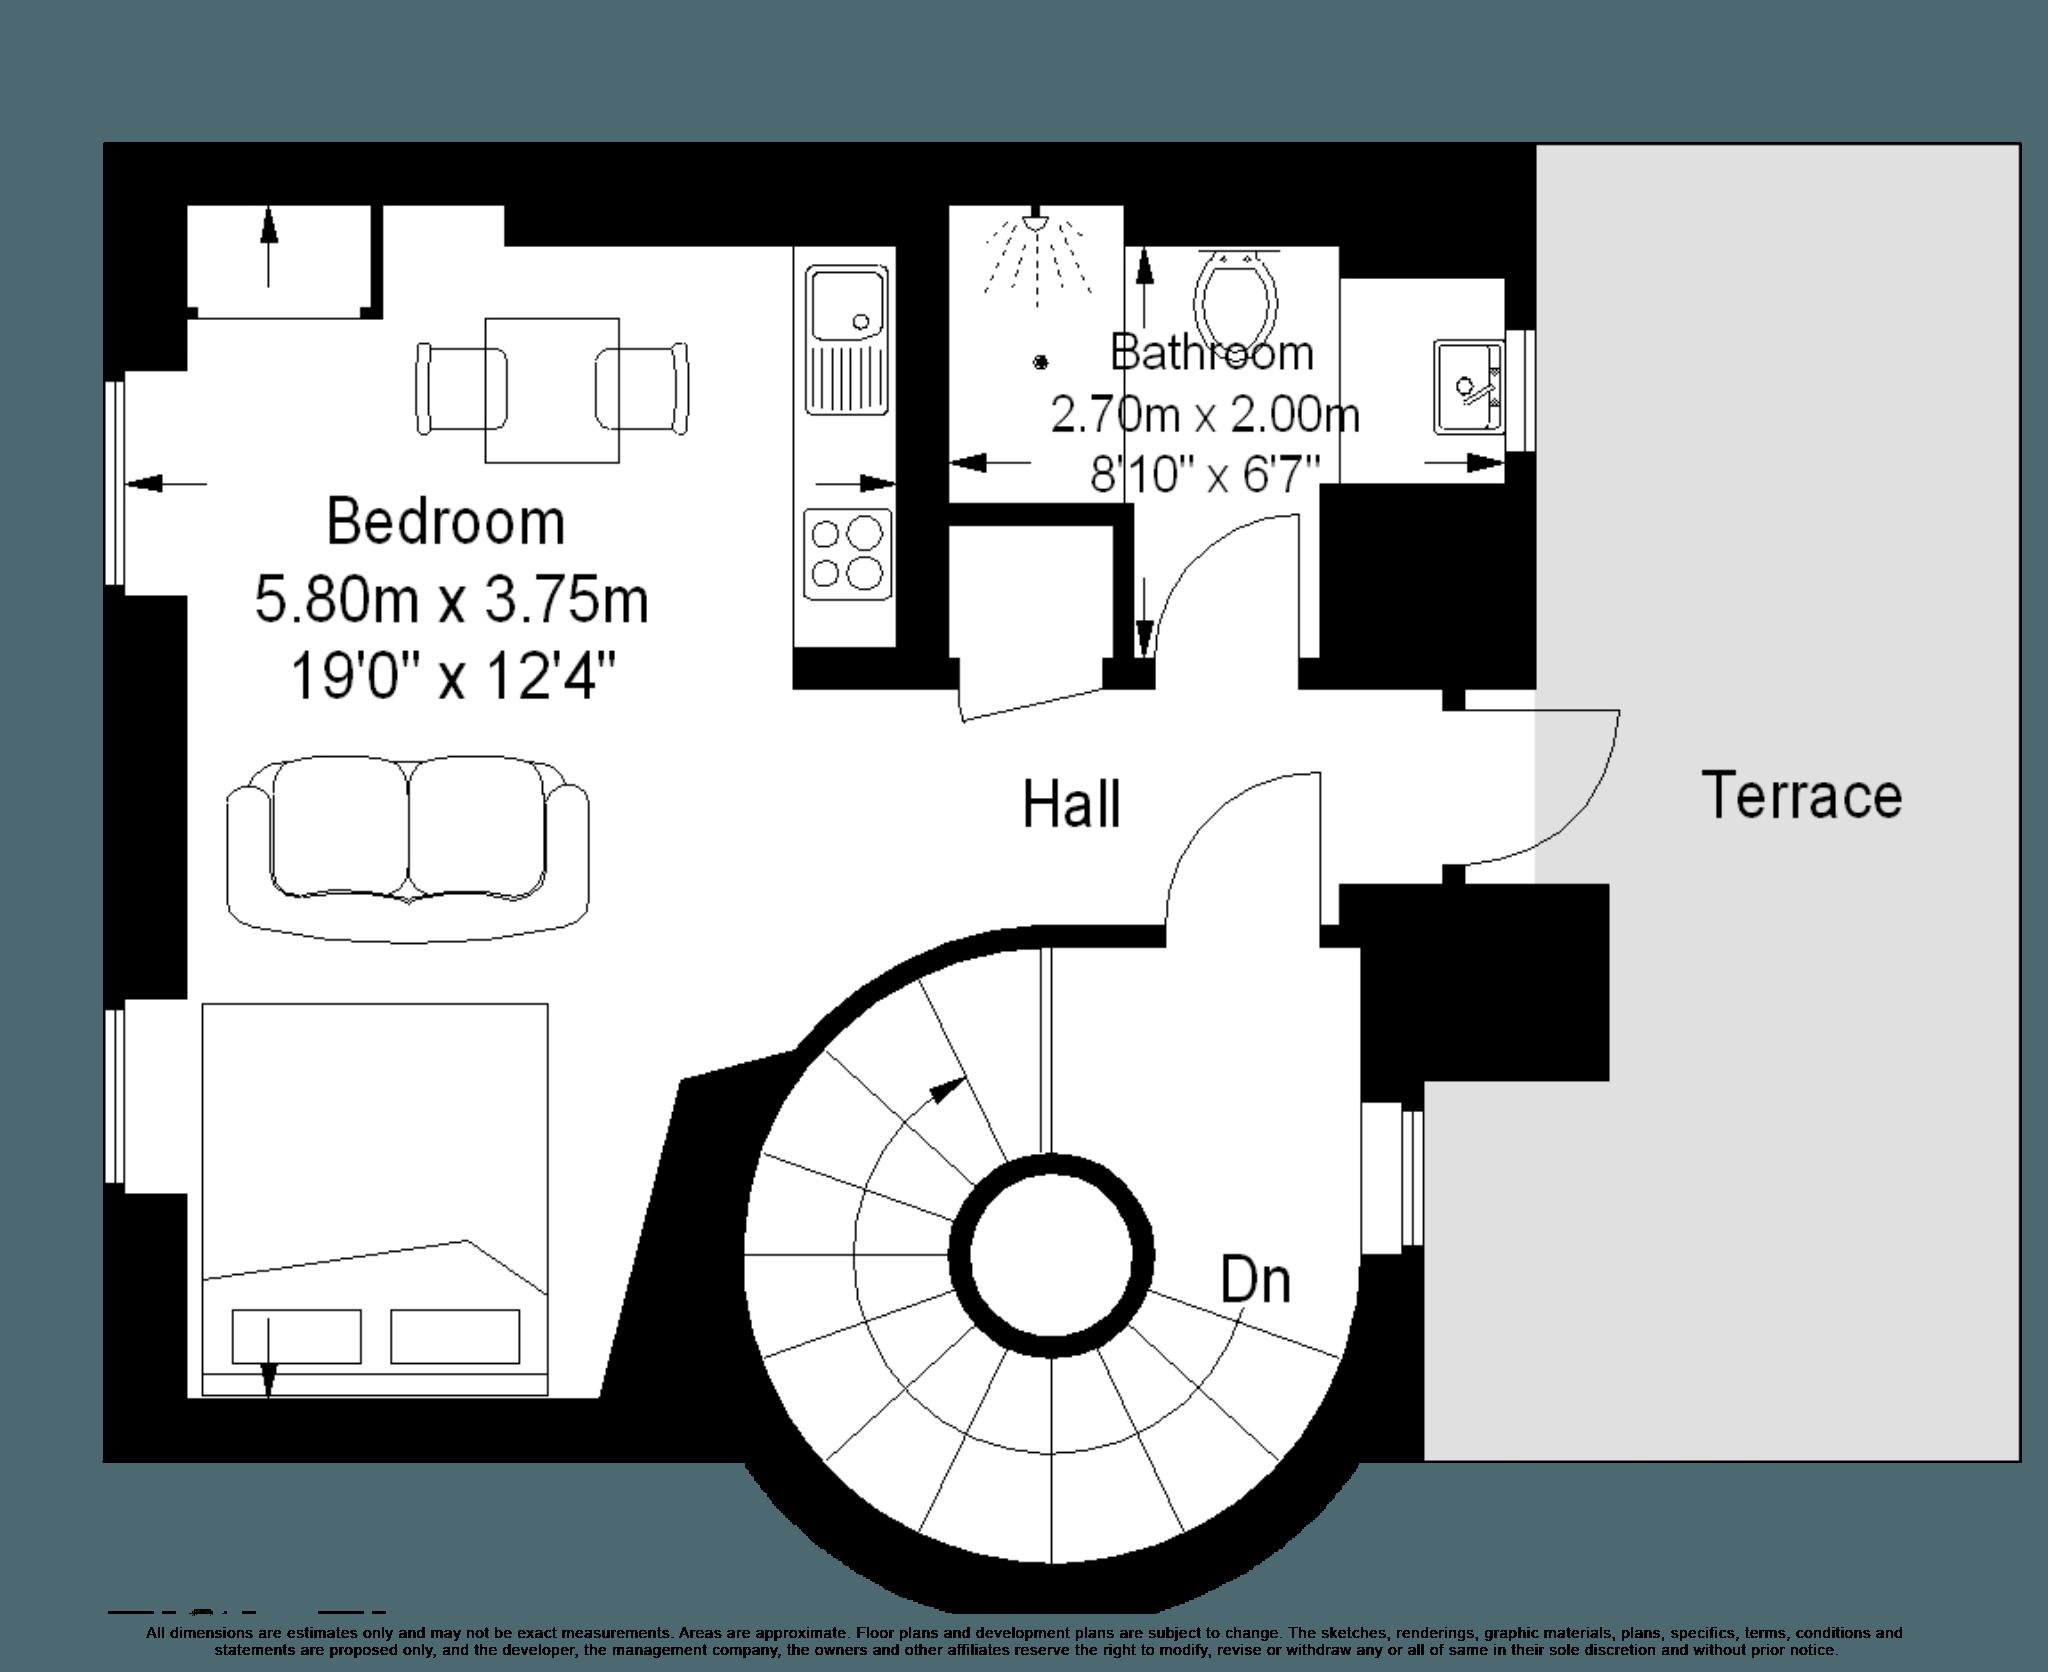 Marylebone Serviced Apartments floorplan studio with terrace